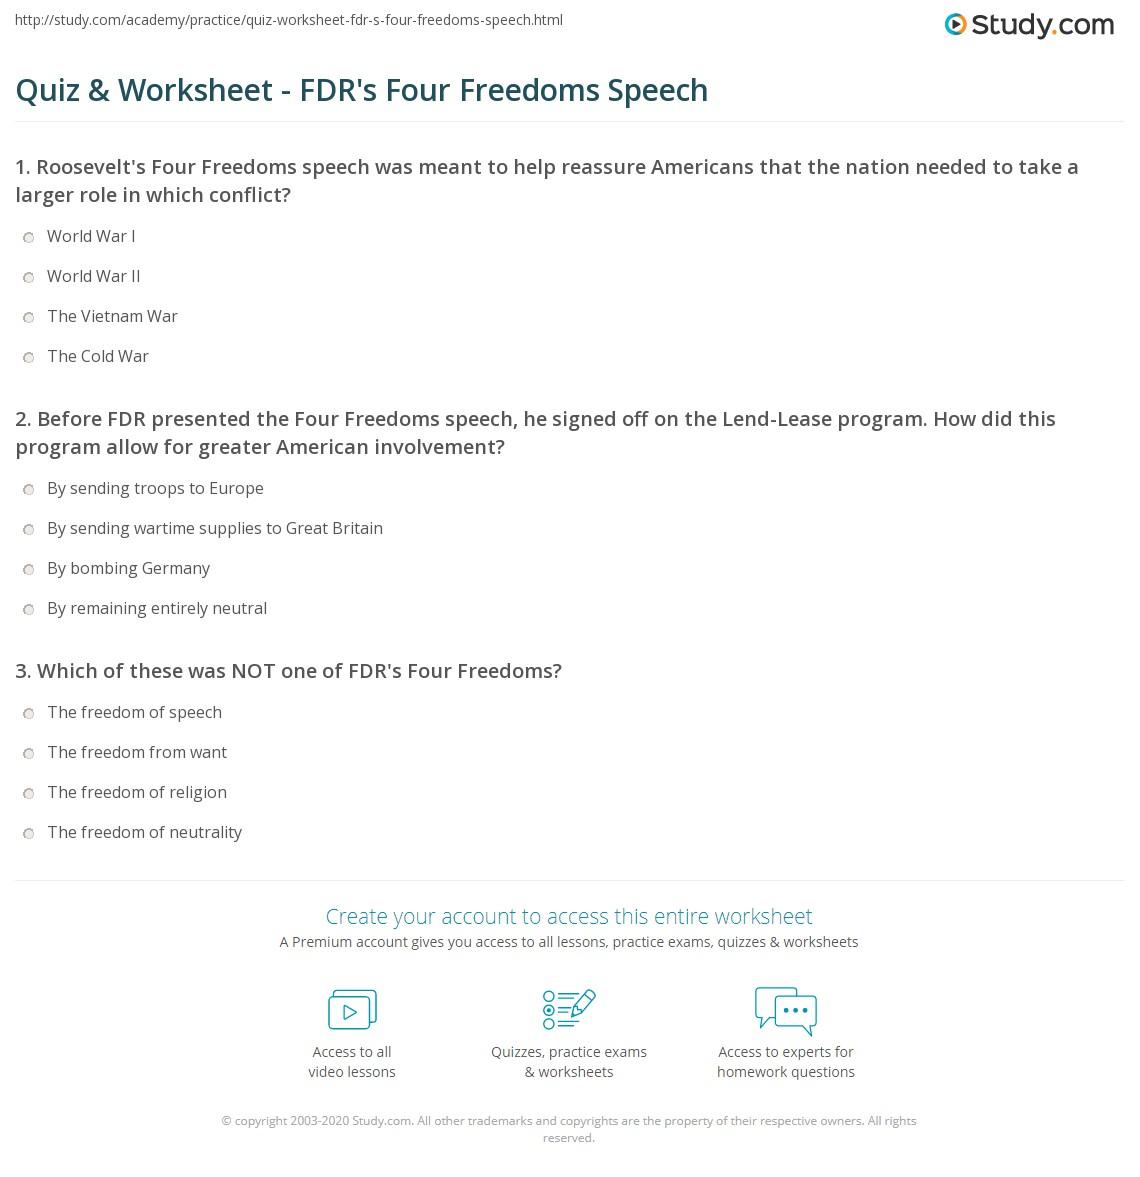 Worksheets Parts Of Speech Worksheets High School quiz worksheet fdrs four freedoms speech study com print roosevelts summary analysis worksheet